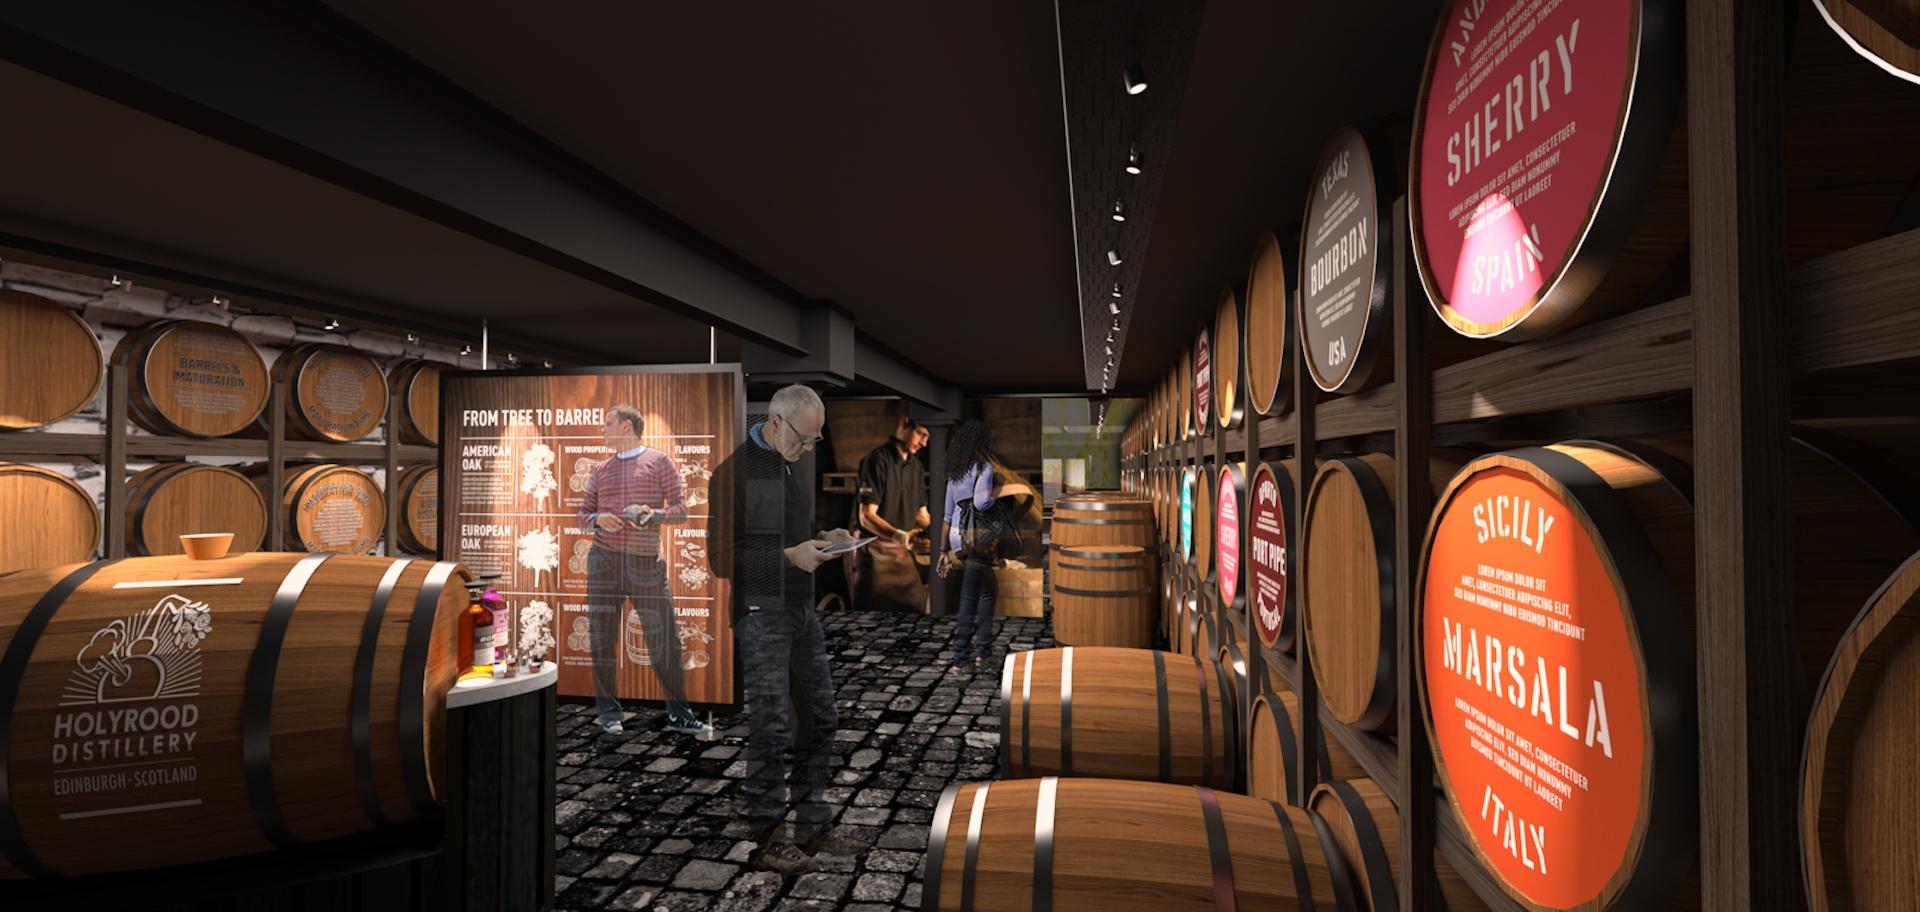 Hollyrood Distillery Edinburgh City Pass